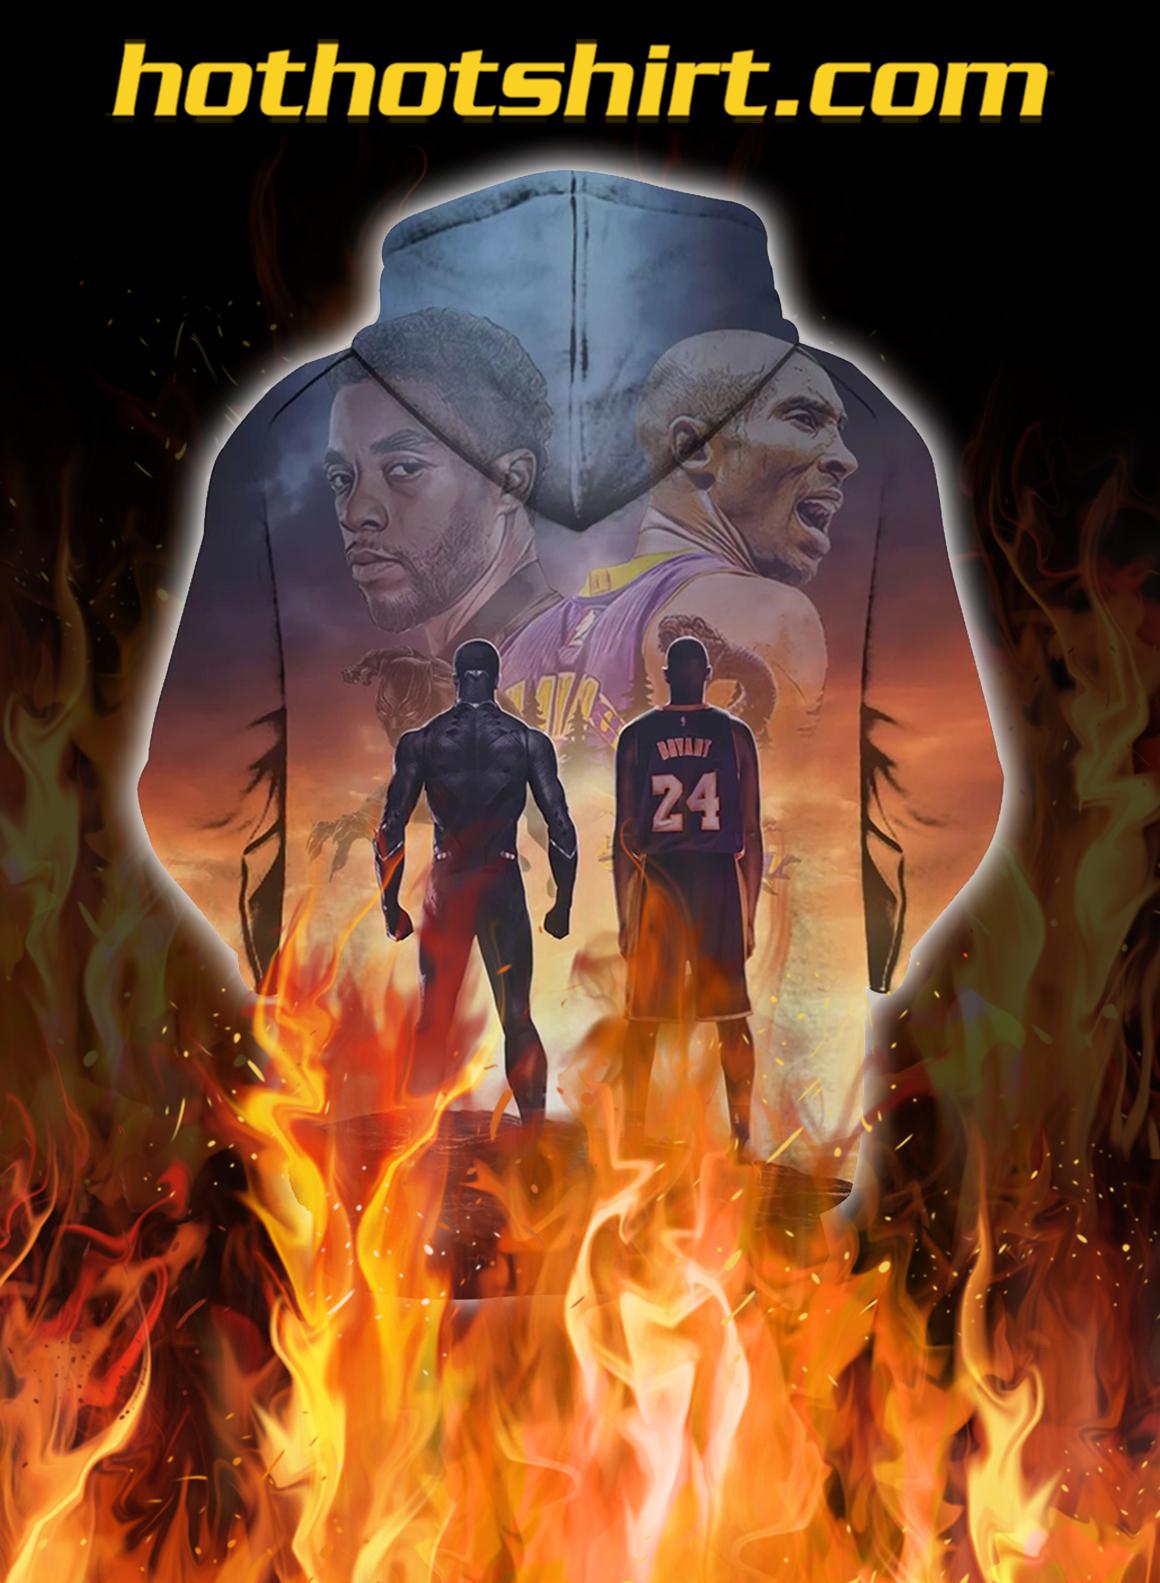 Kobe bryant and chadwick boseman 3d fullprint hoodie- back